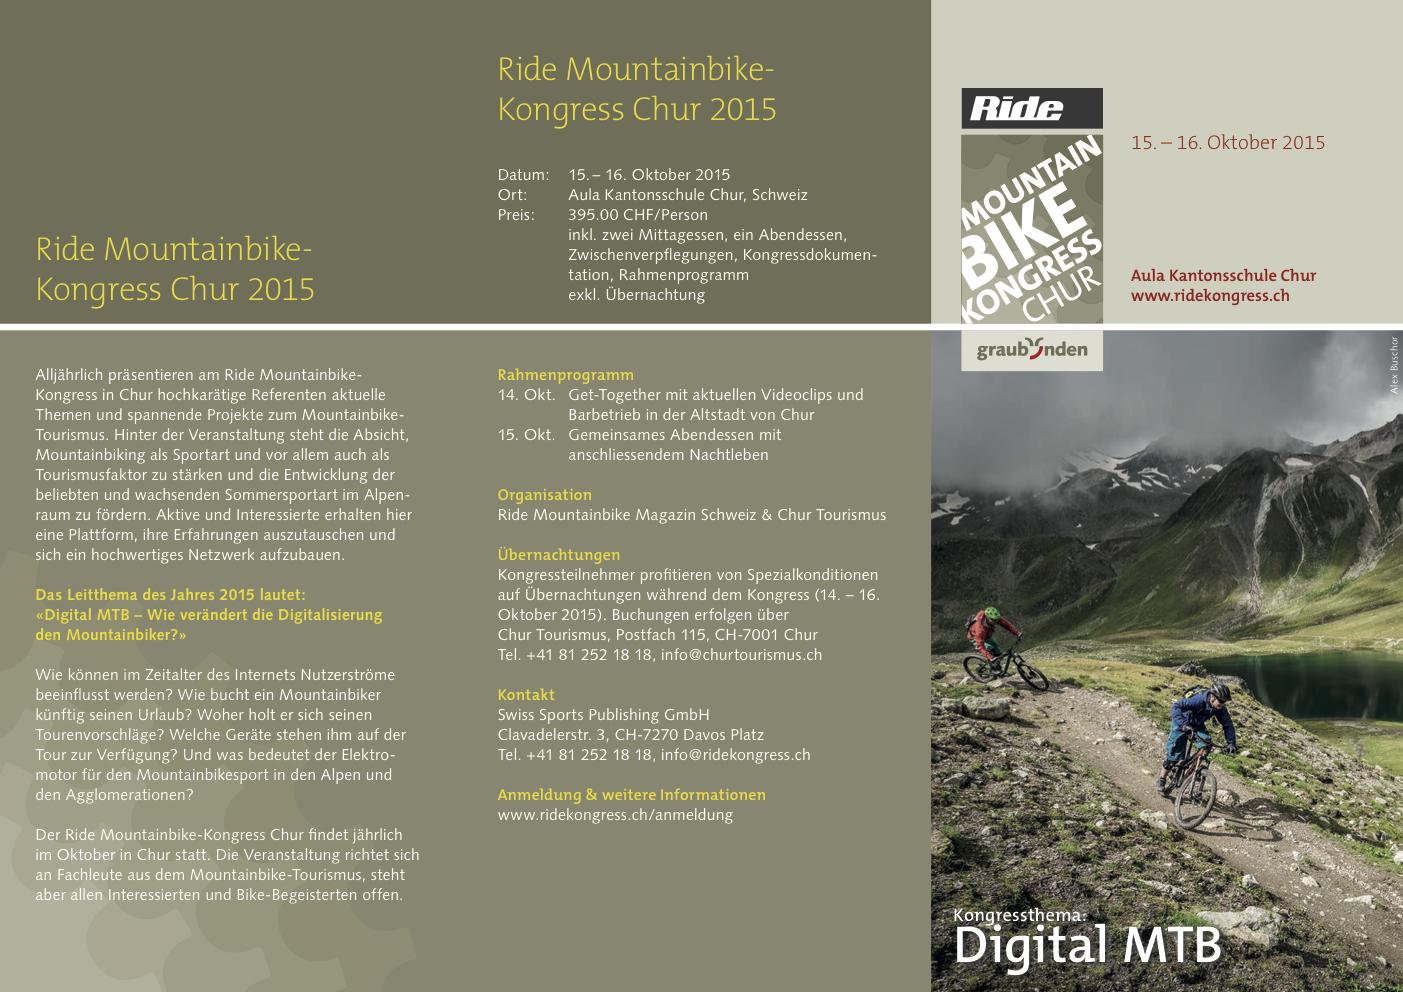 flyer ride mountainbike kongresse 2015